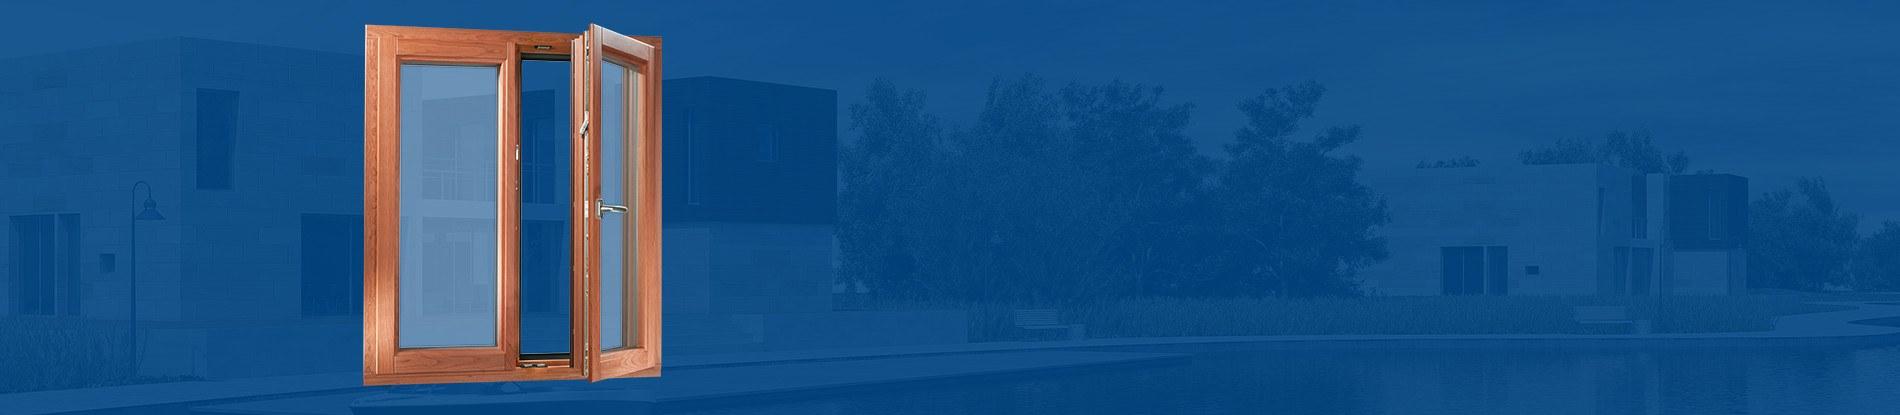 Fenster Holz Alu Kunststoff ~   holz alu fenster die perfekte materialkombination holz alu fenster